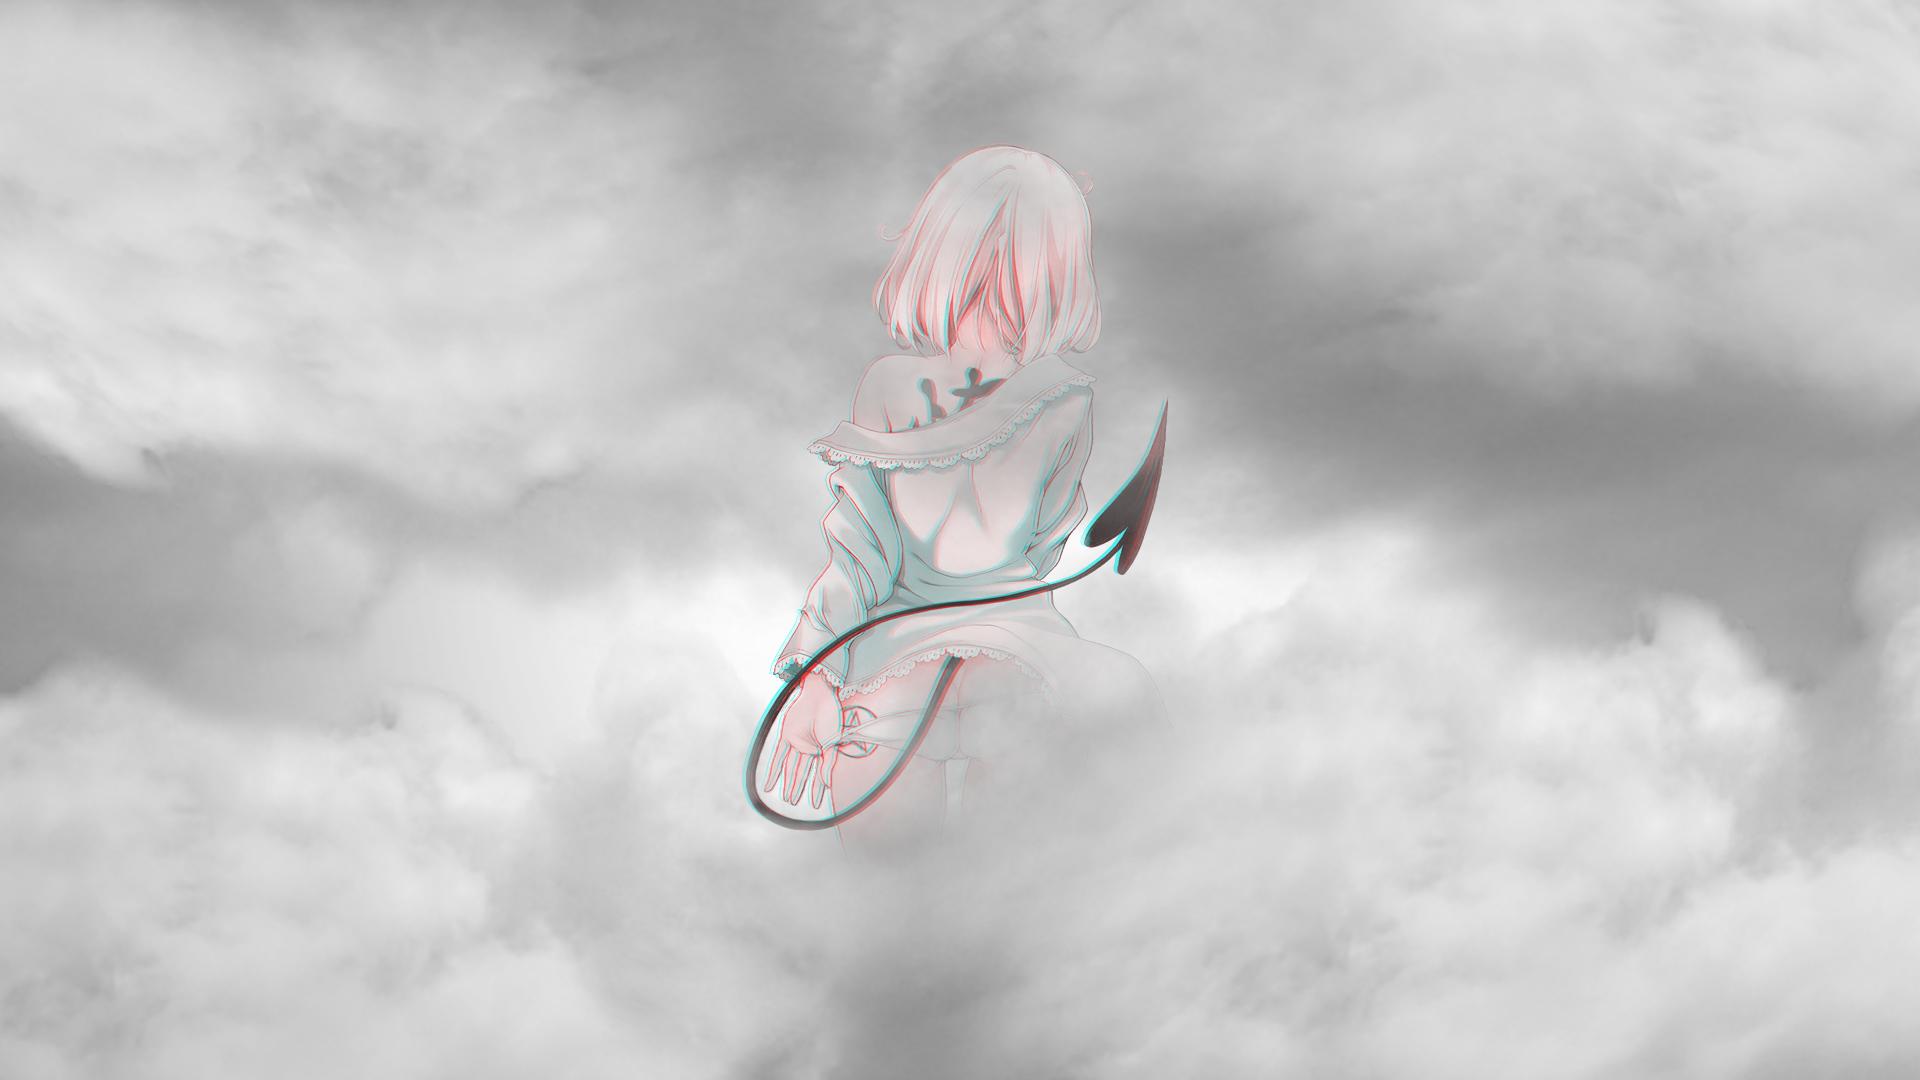 Anime 1920x1080 anime anime girls pink hair To love ru To Love-ru Darkness Momo Momo Velia Deviluke clouds ecchi